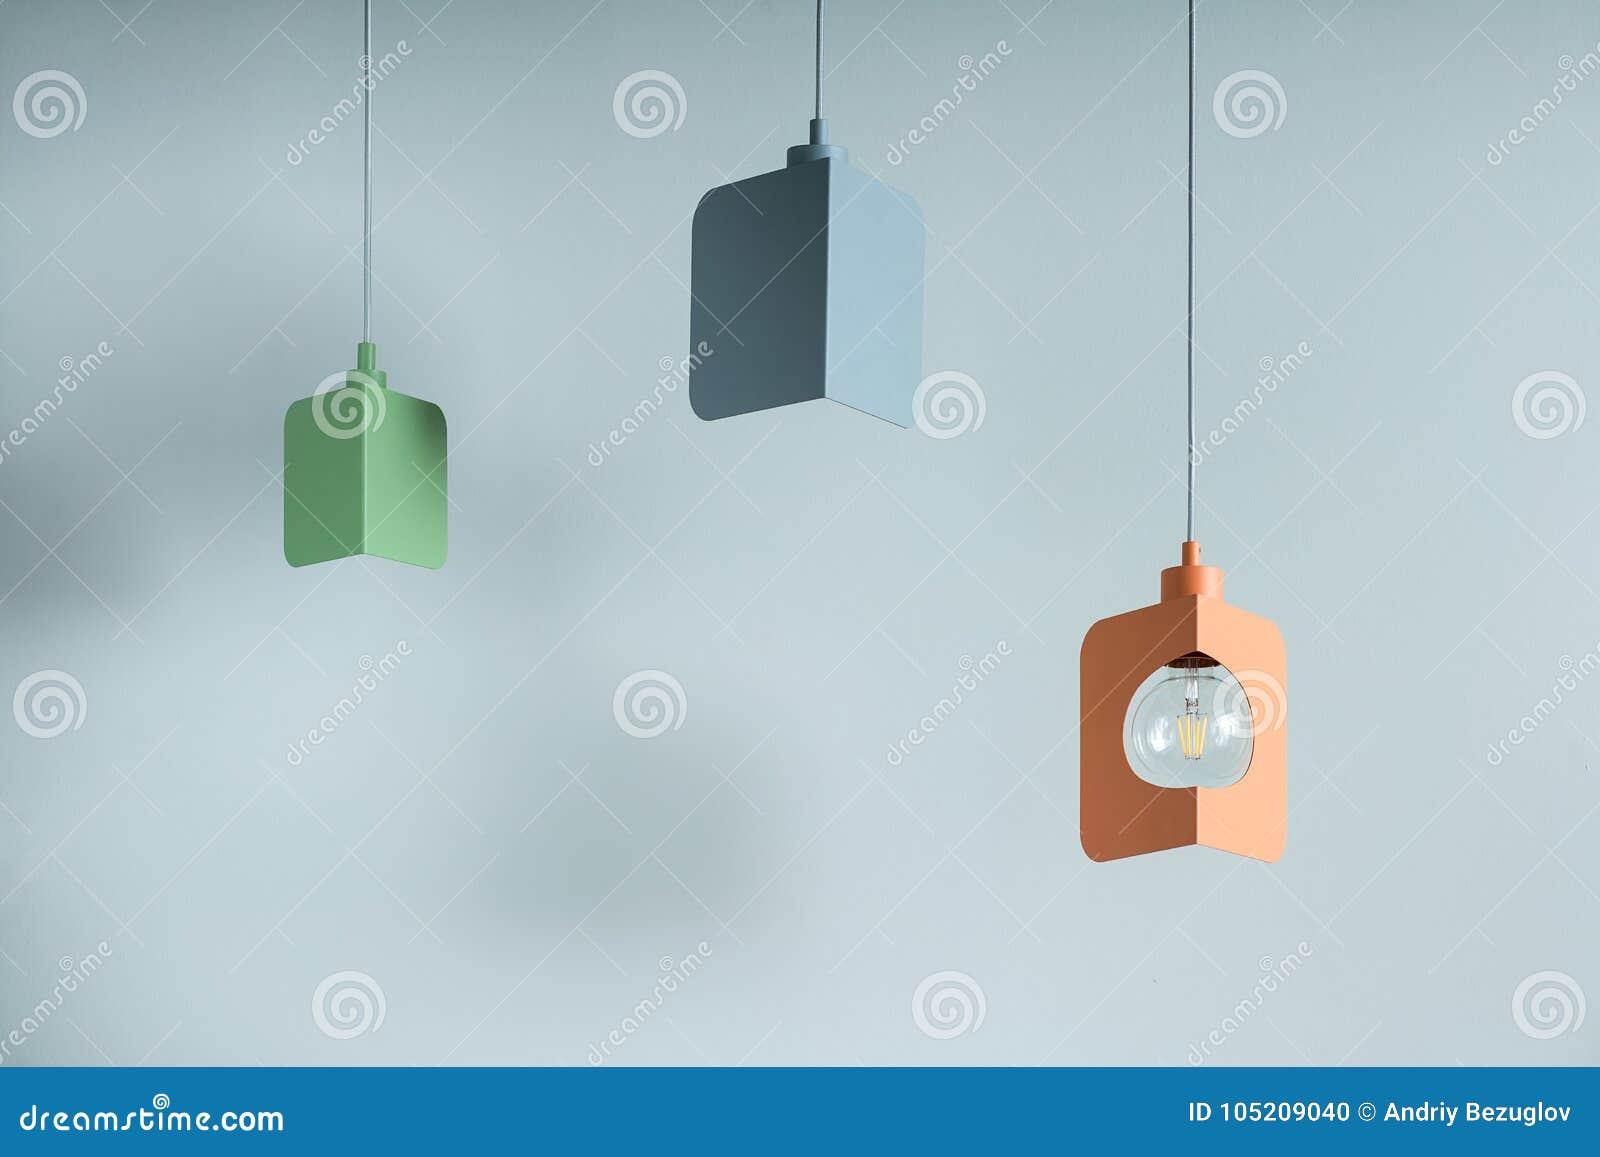 Edison Lamp Diagram - Car Wiring Diagrams Explained •